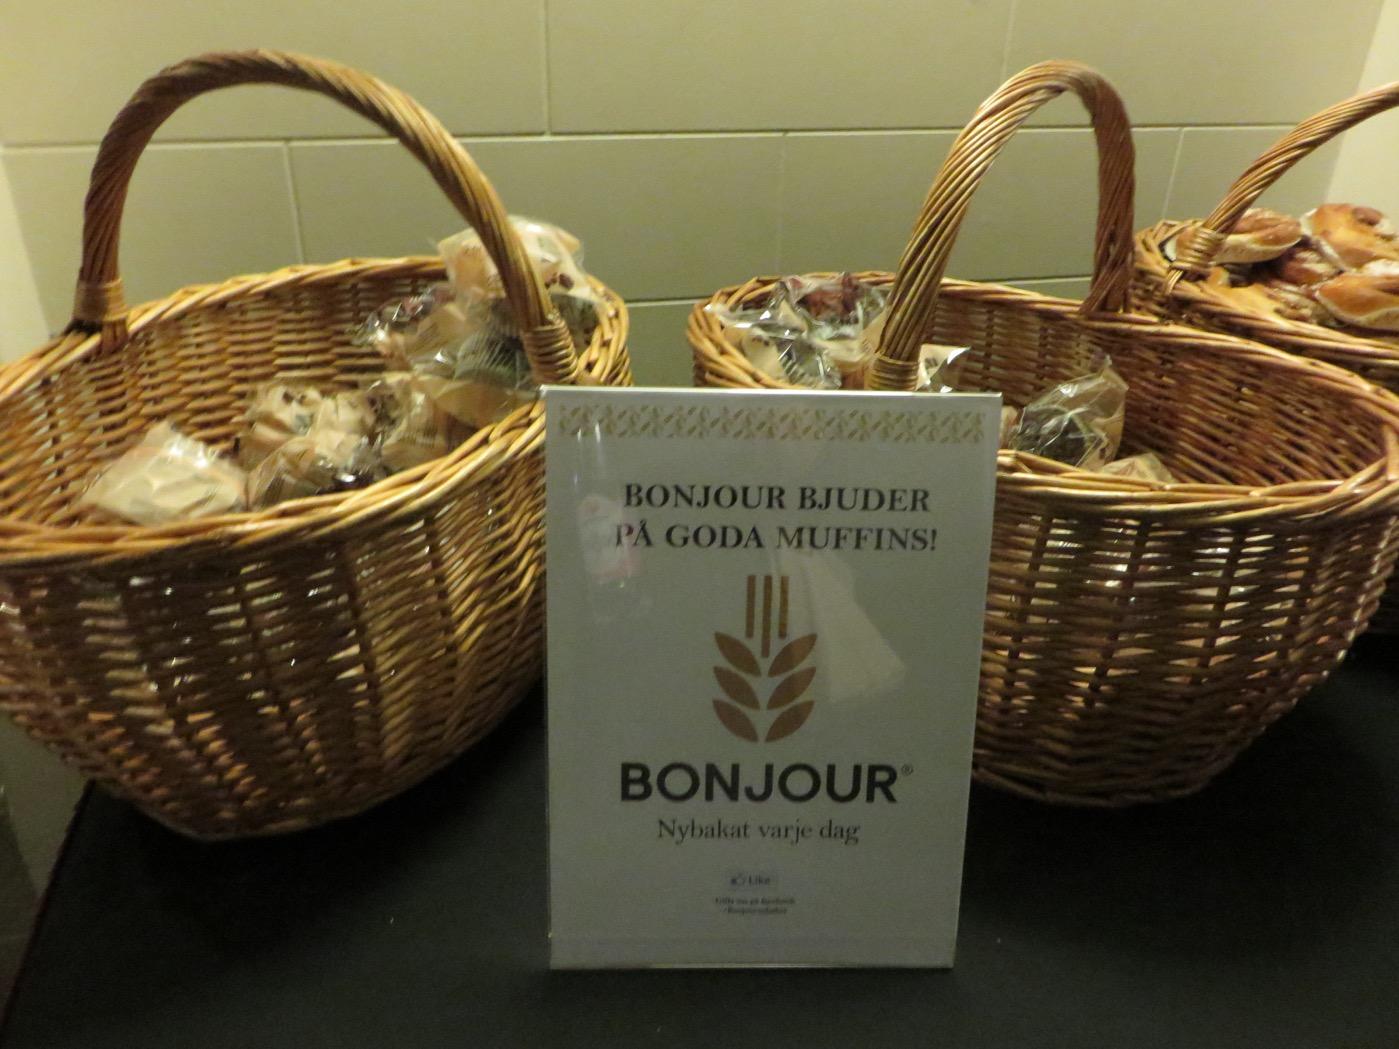 Muffins från Bonjour.